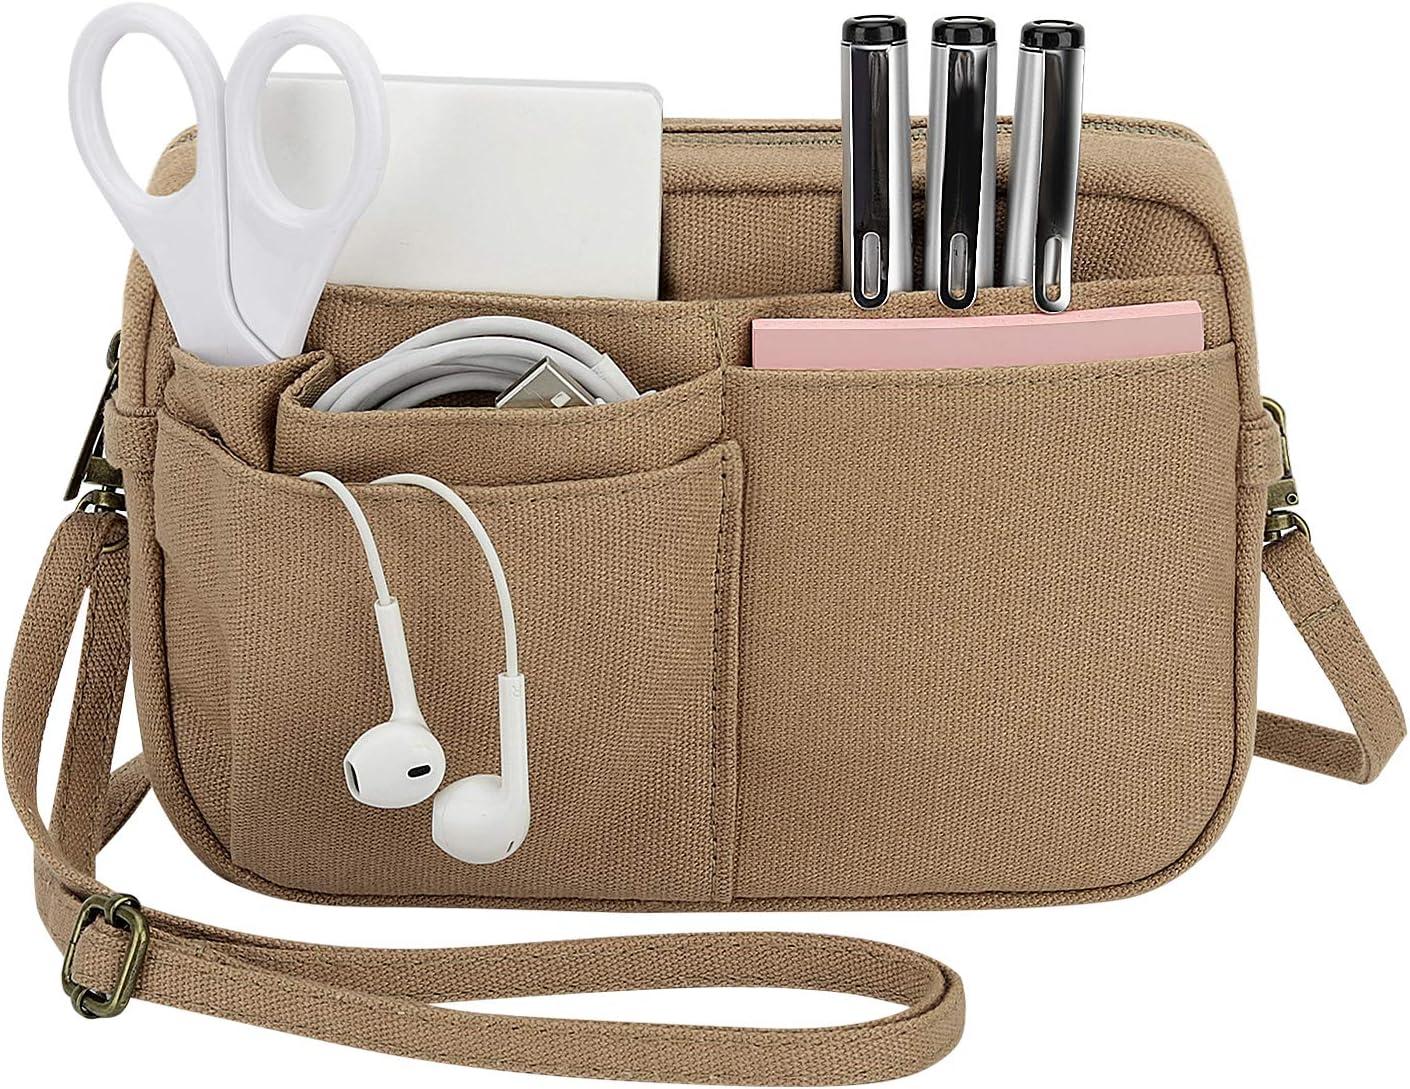 Dadanism Purse Bag Organizer Insert, 2-in-1 Canvas Multi-Pocket Bag Organizer with Zipper, Handbag & Tote Organizer, Bag in Bag, Toiletry Bag, Crossbody Bag with Adjustable Shoulder Strap - Brown